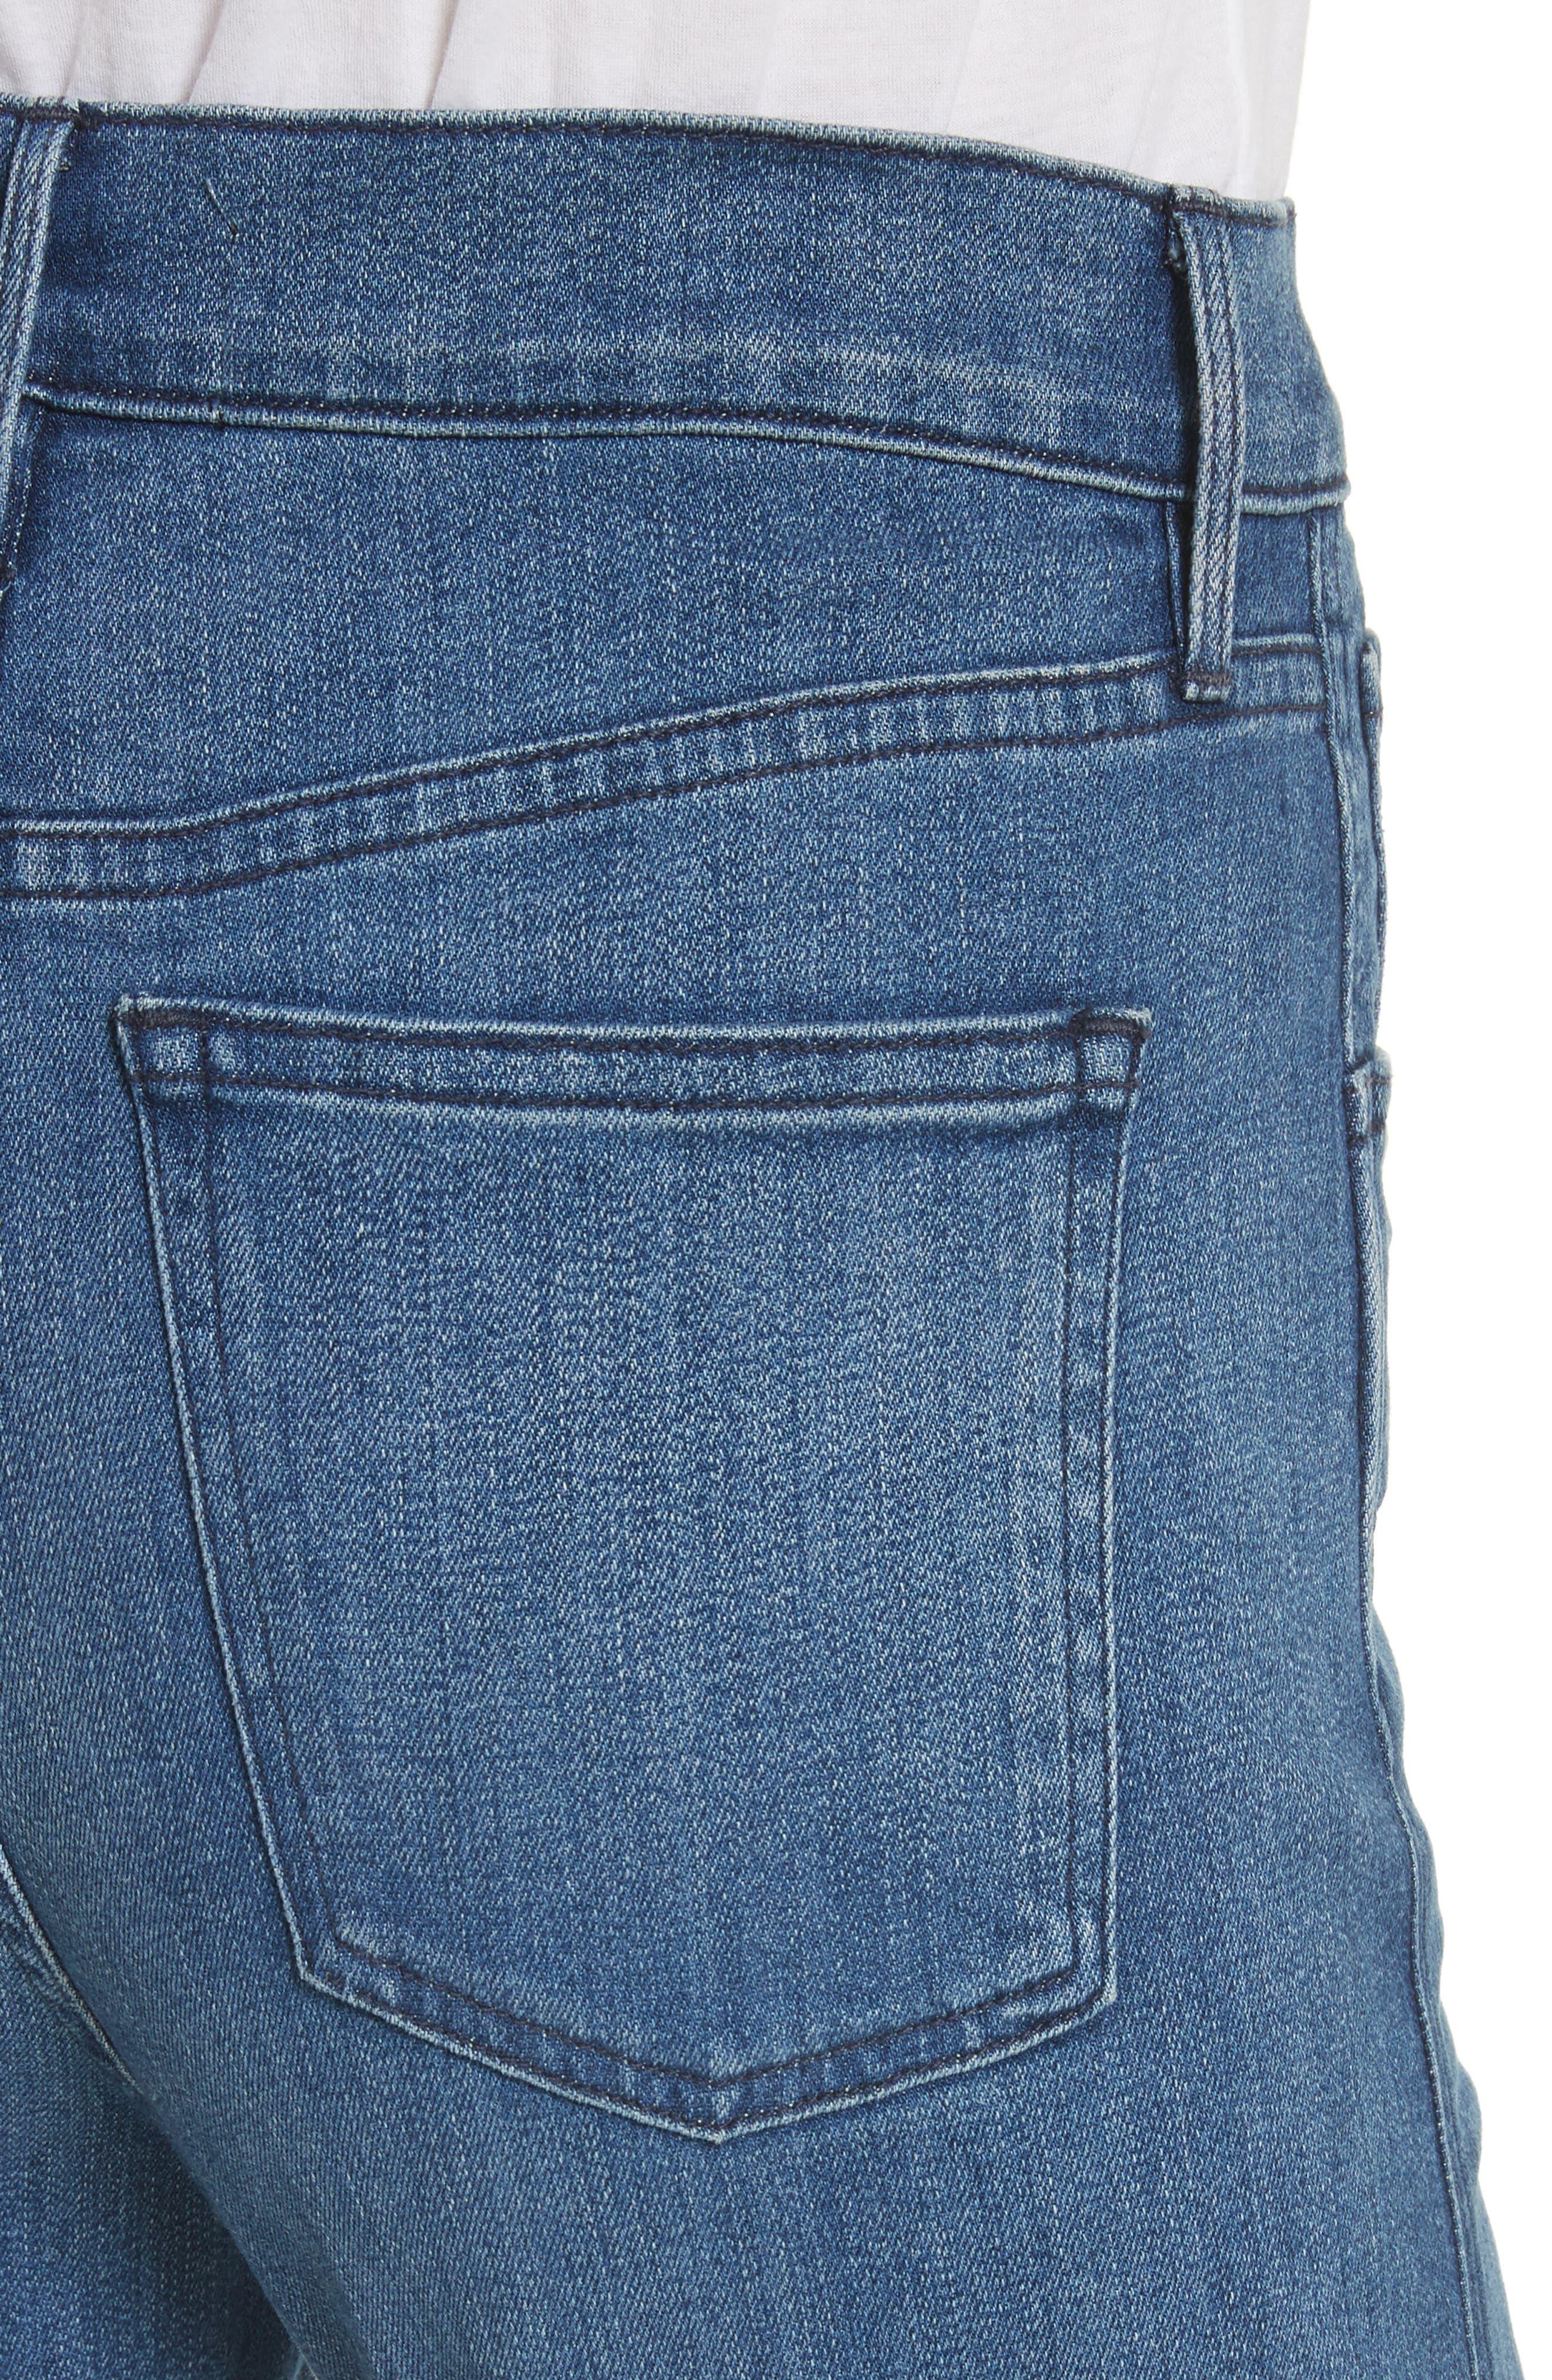 W4 Adeline High Waist Split Flare Jeans,                             Alternate thumbnail 4, color,                             Leia